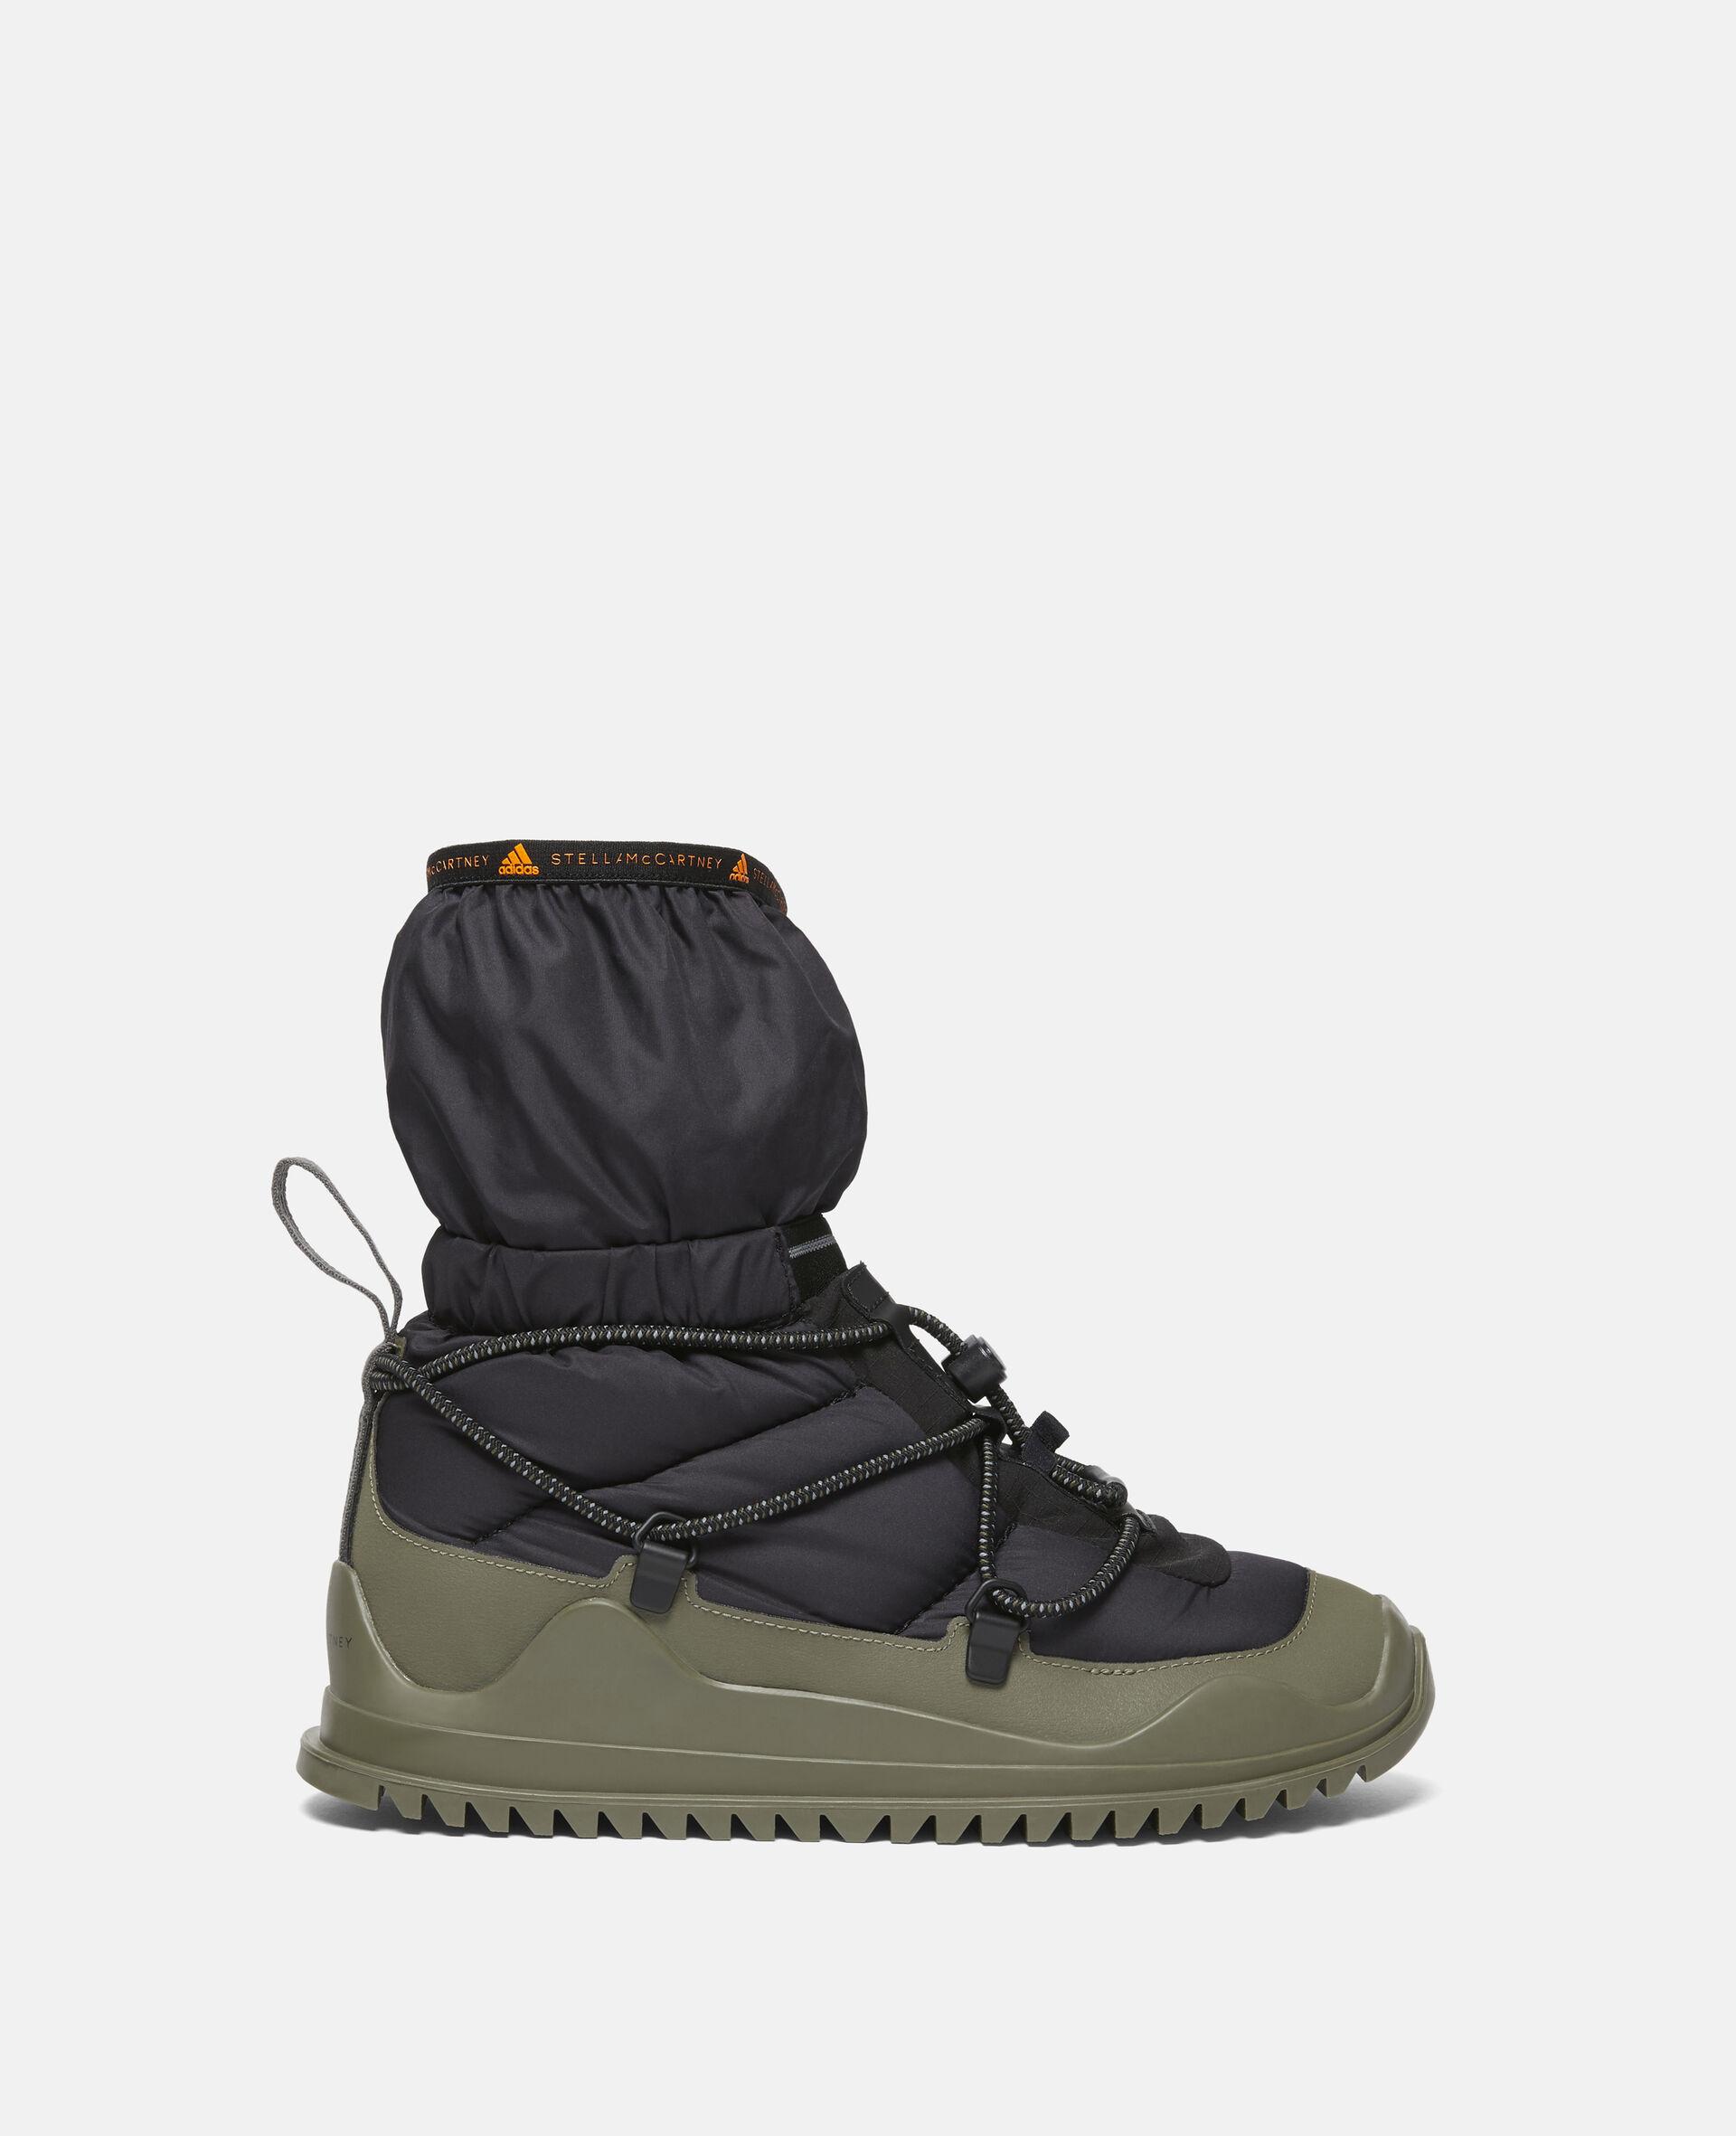 Winter Boots-Black-large image number 0